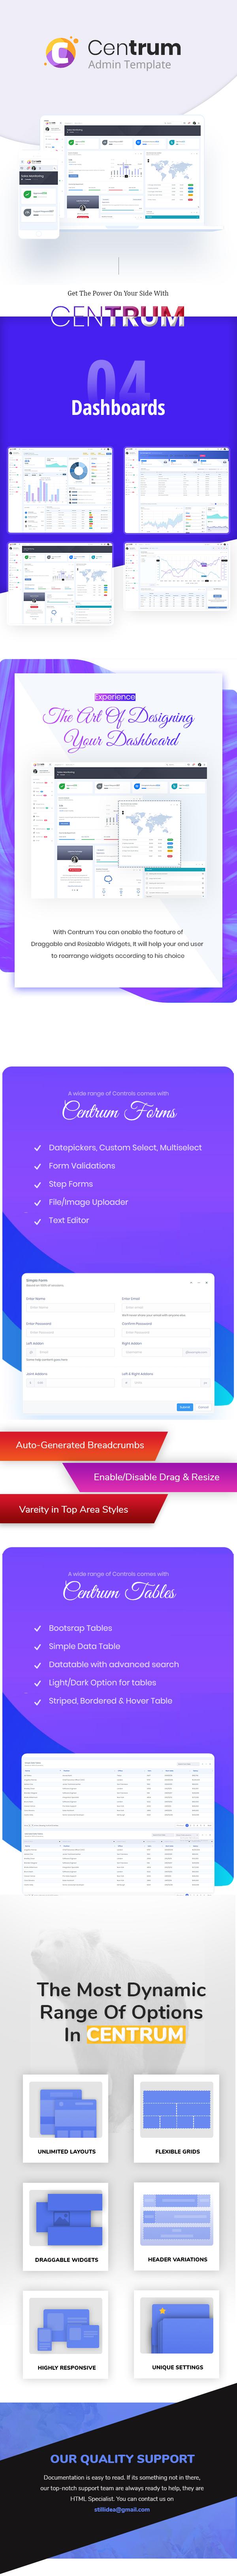 Centrum - Responsive Bootstrap 4 Admin Dashboard Template